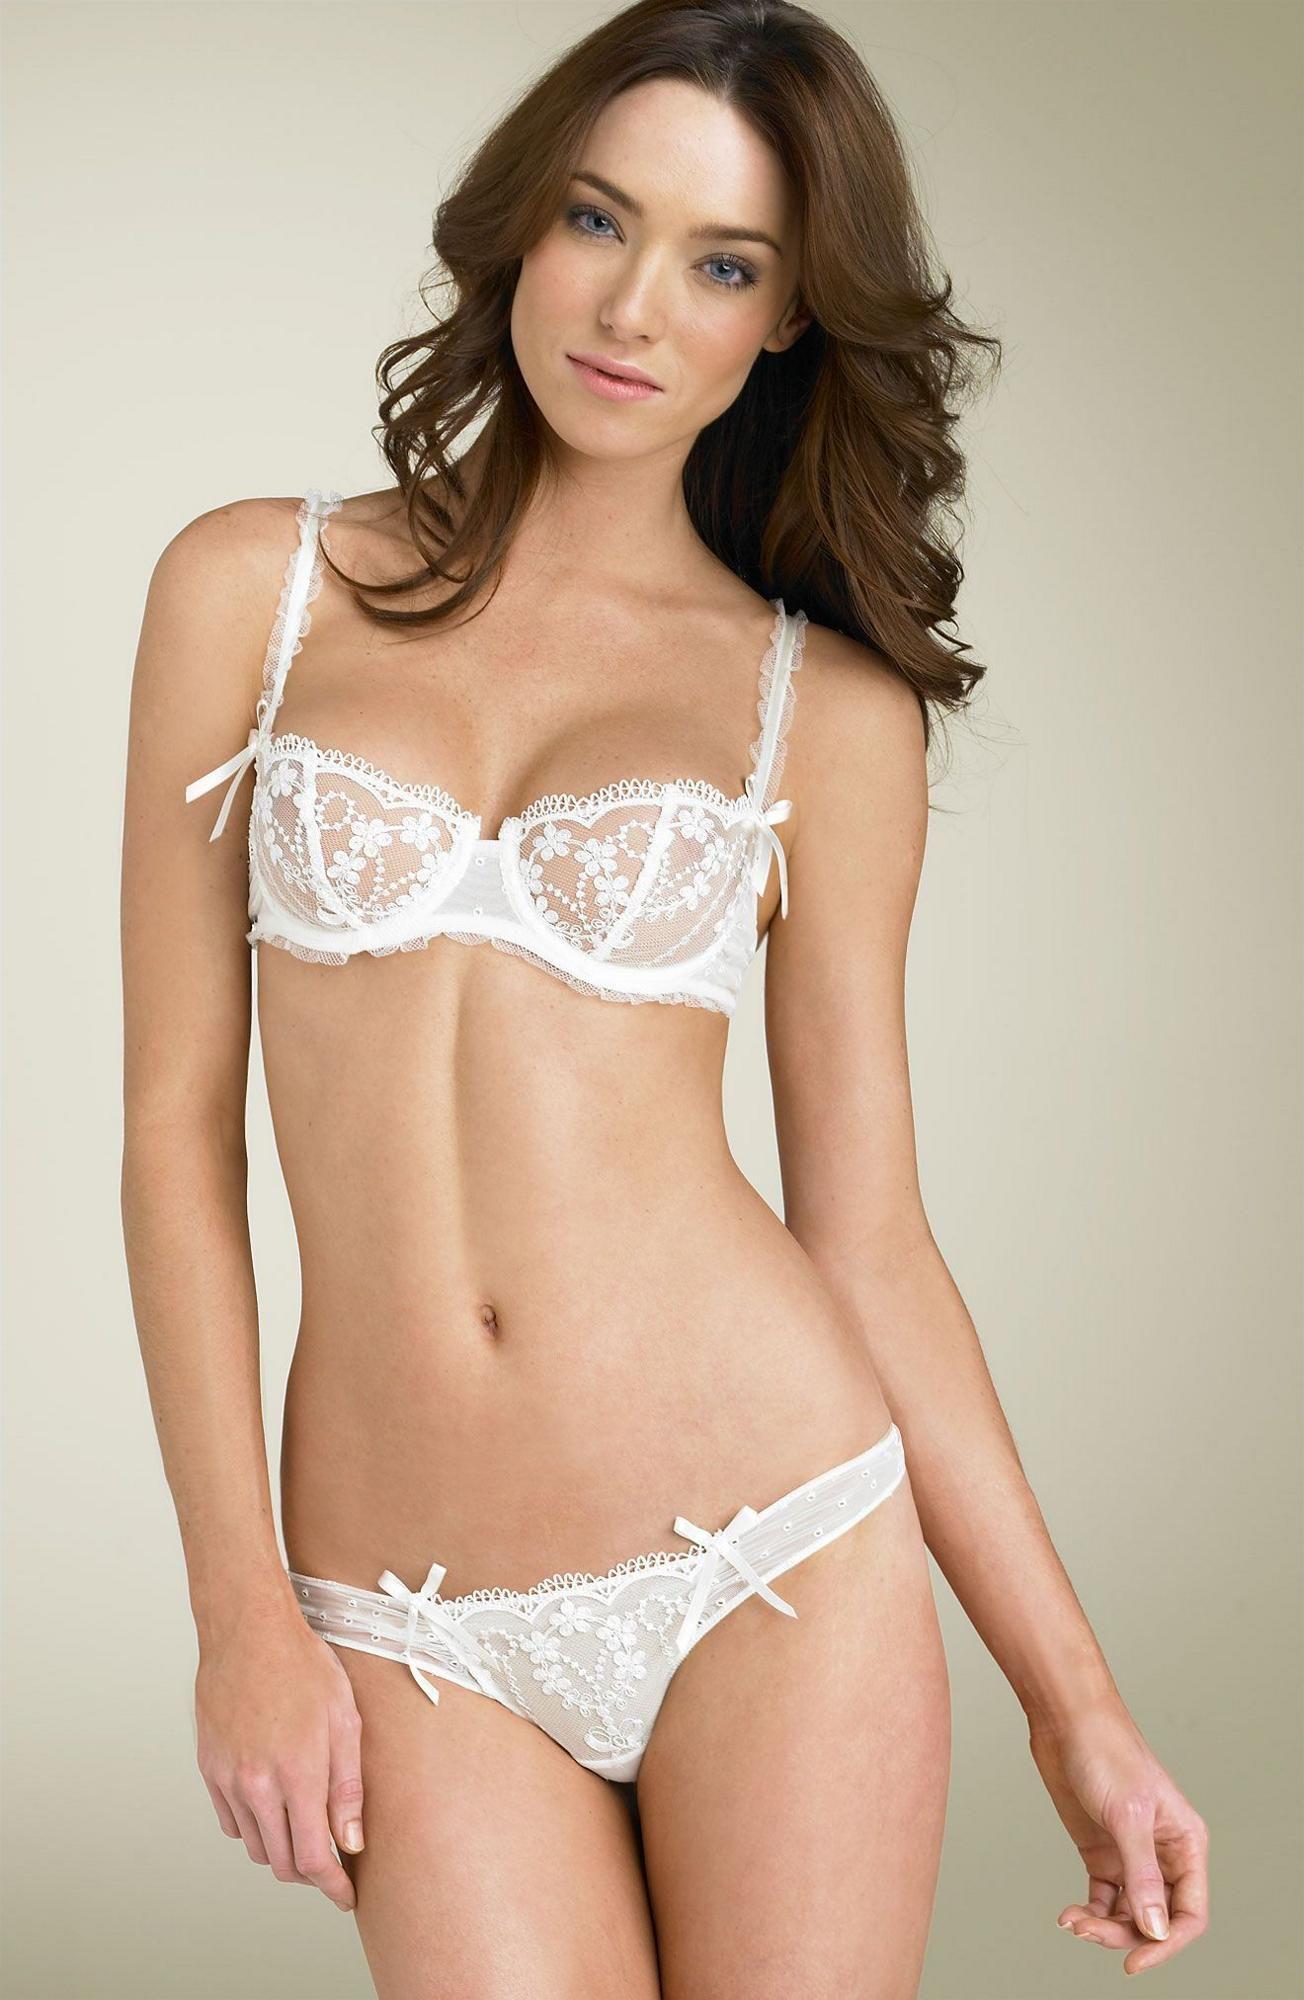 e92bda31c5 Cassi Colvin of Big Brother Season 13 models sexy lingerie